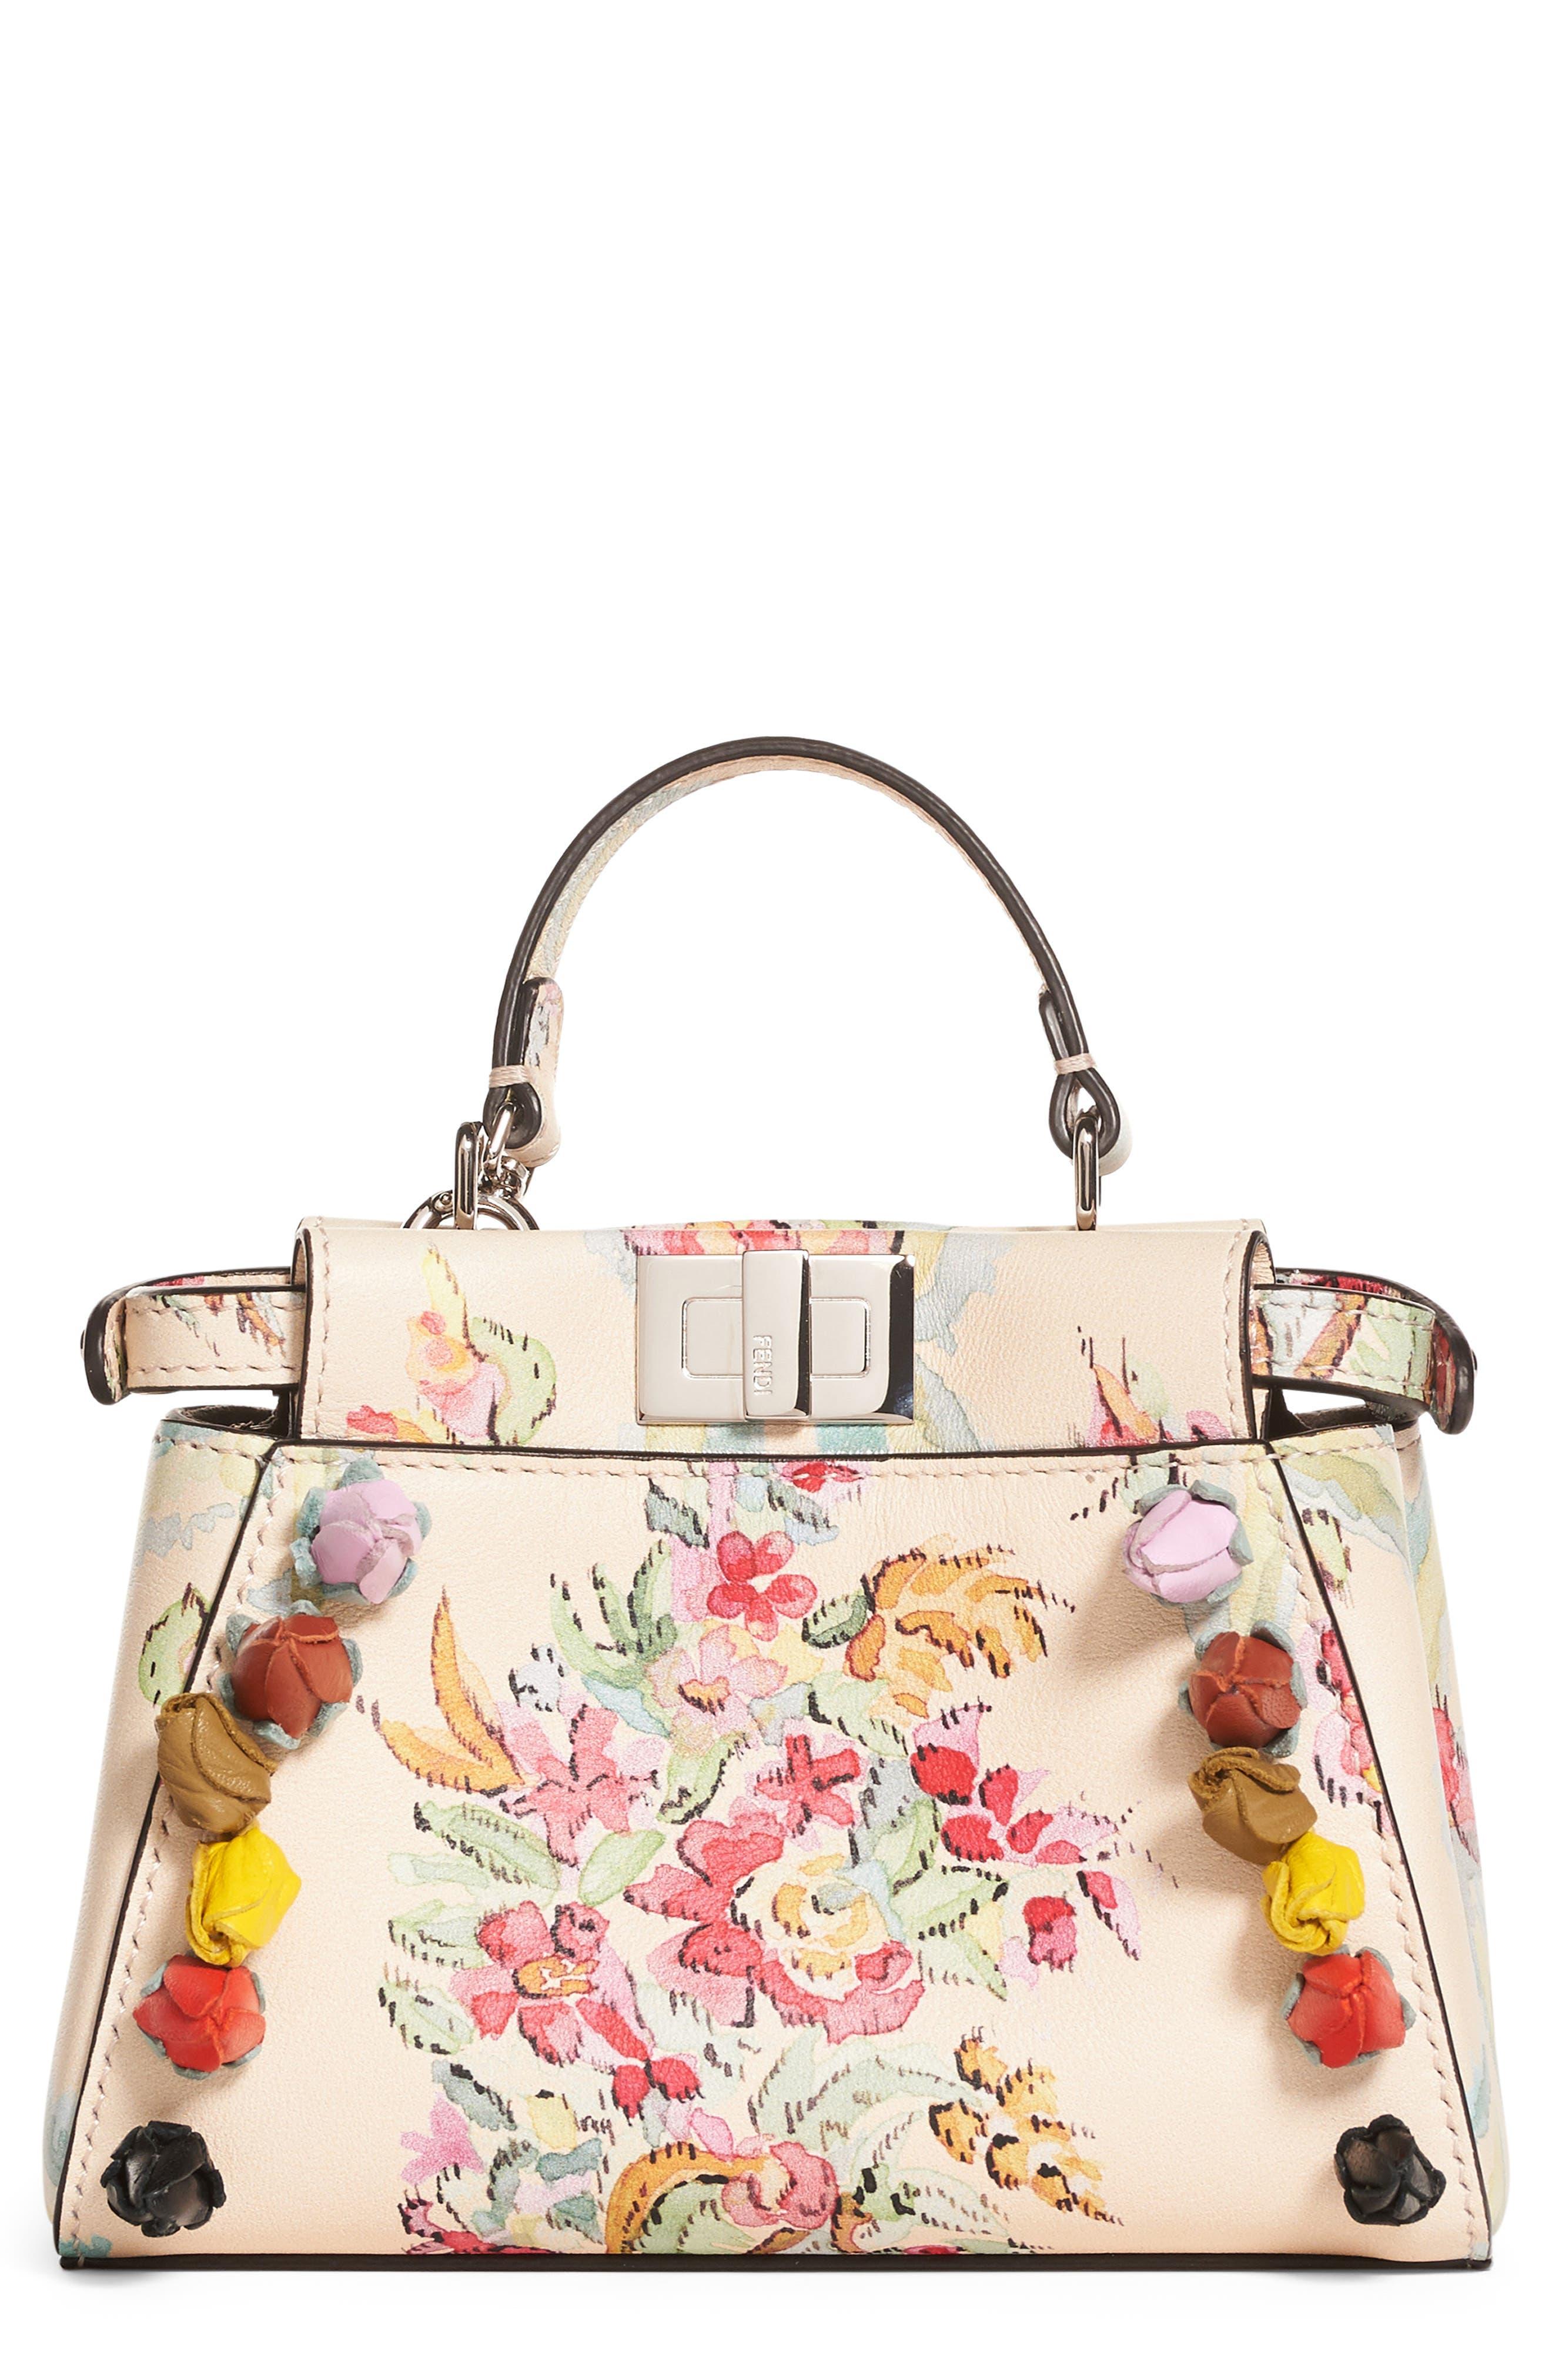 Main Image - Fendi Micro Peekaboo Floral Appliqué Leather Satchel